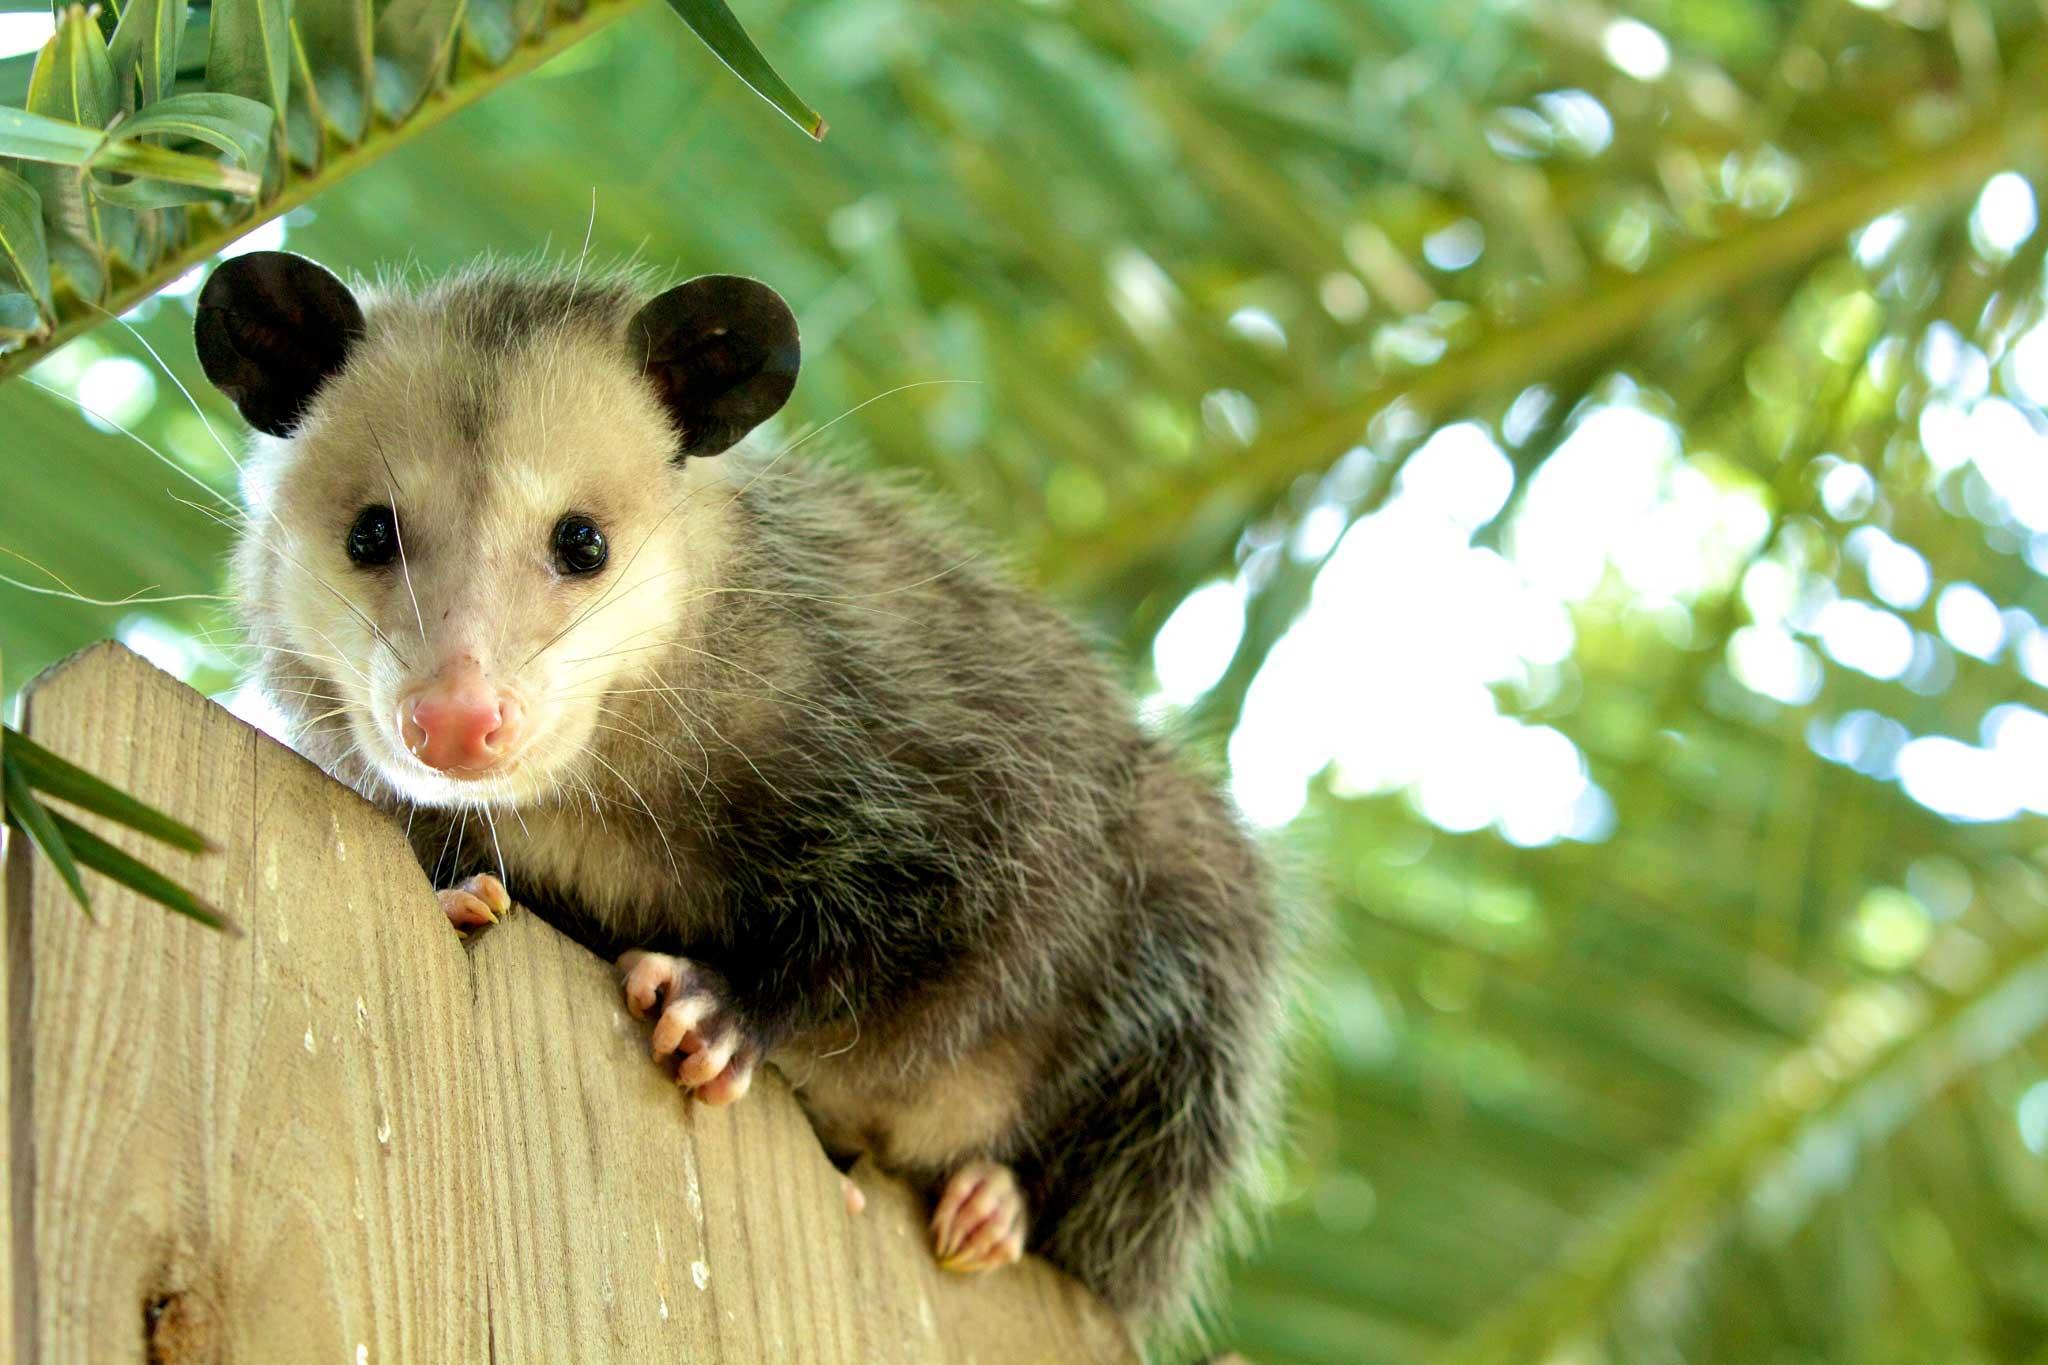 Virginia-opossum 70-million-years-ago Surprisingly Ancient Species vol.1